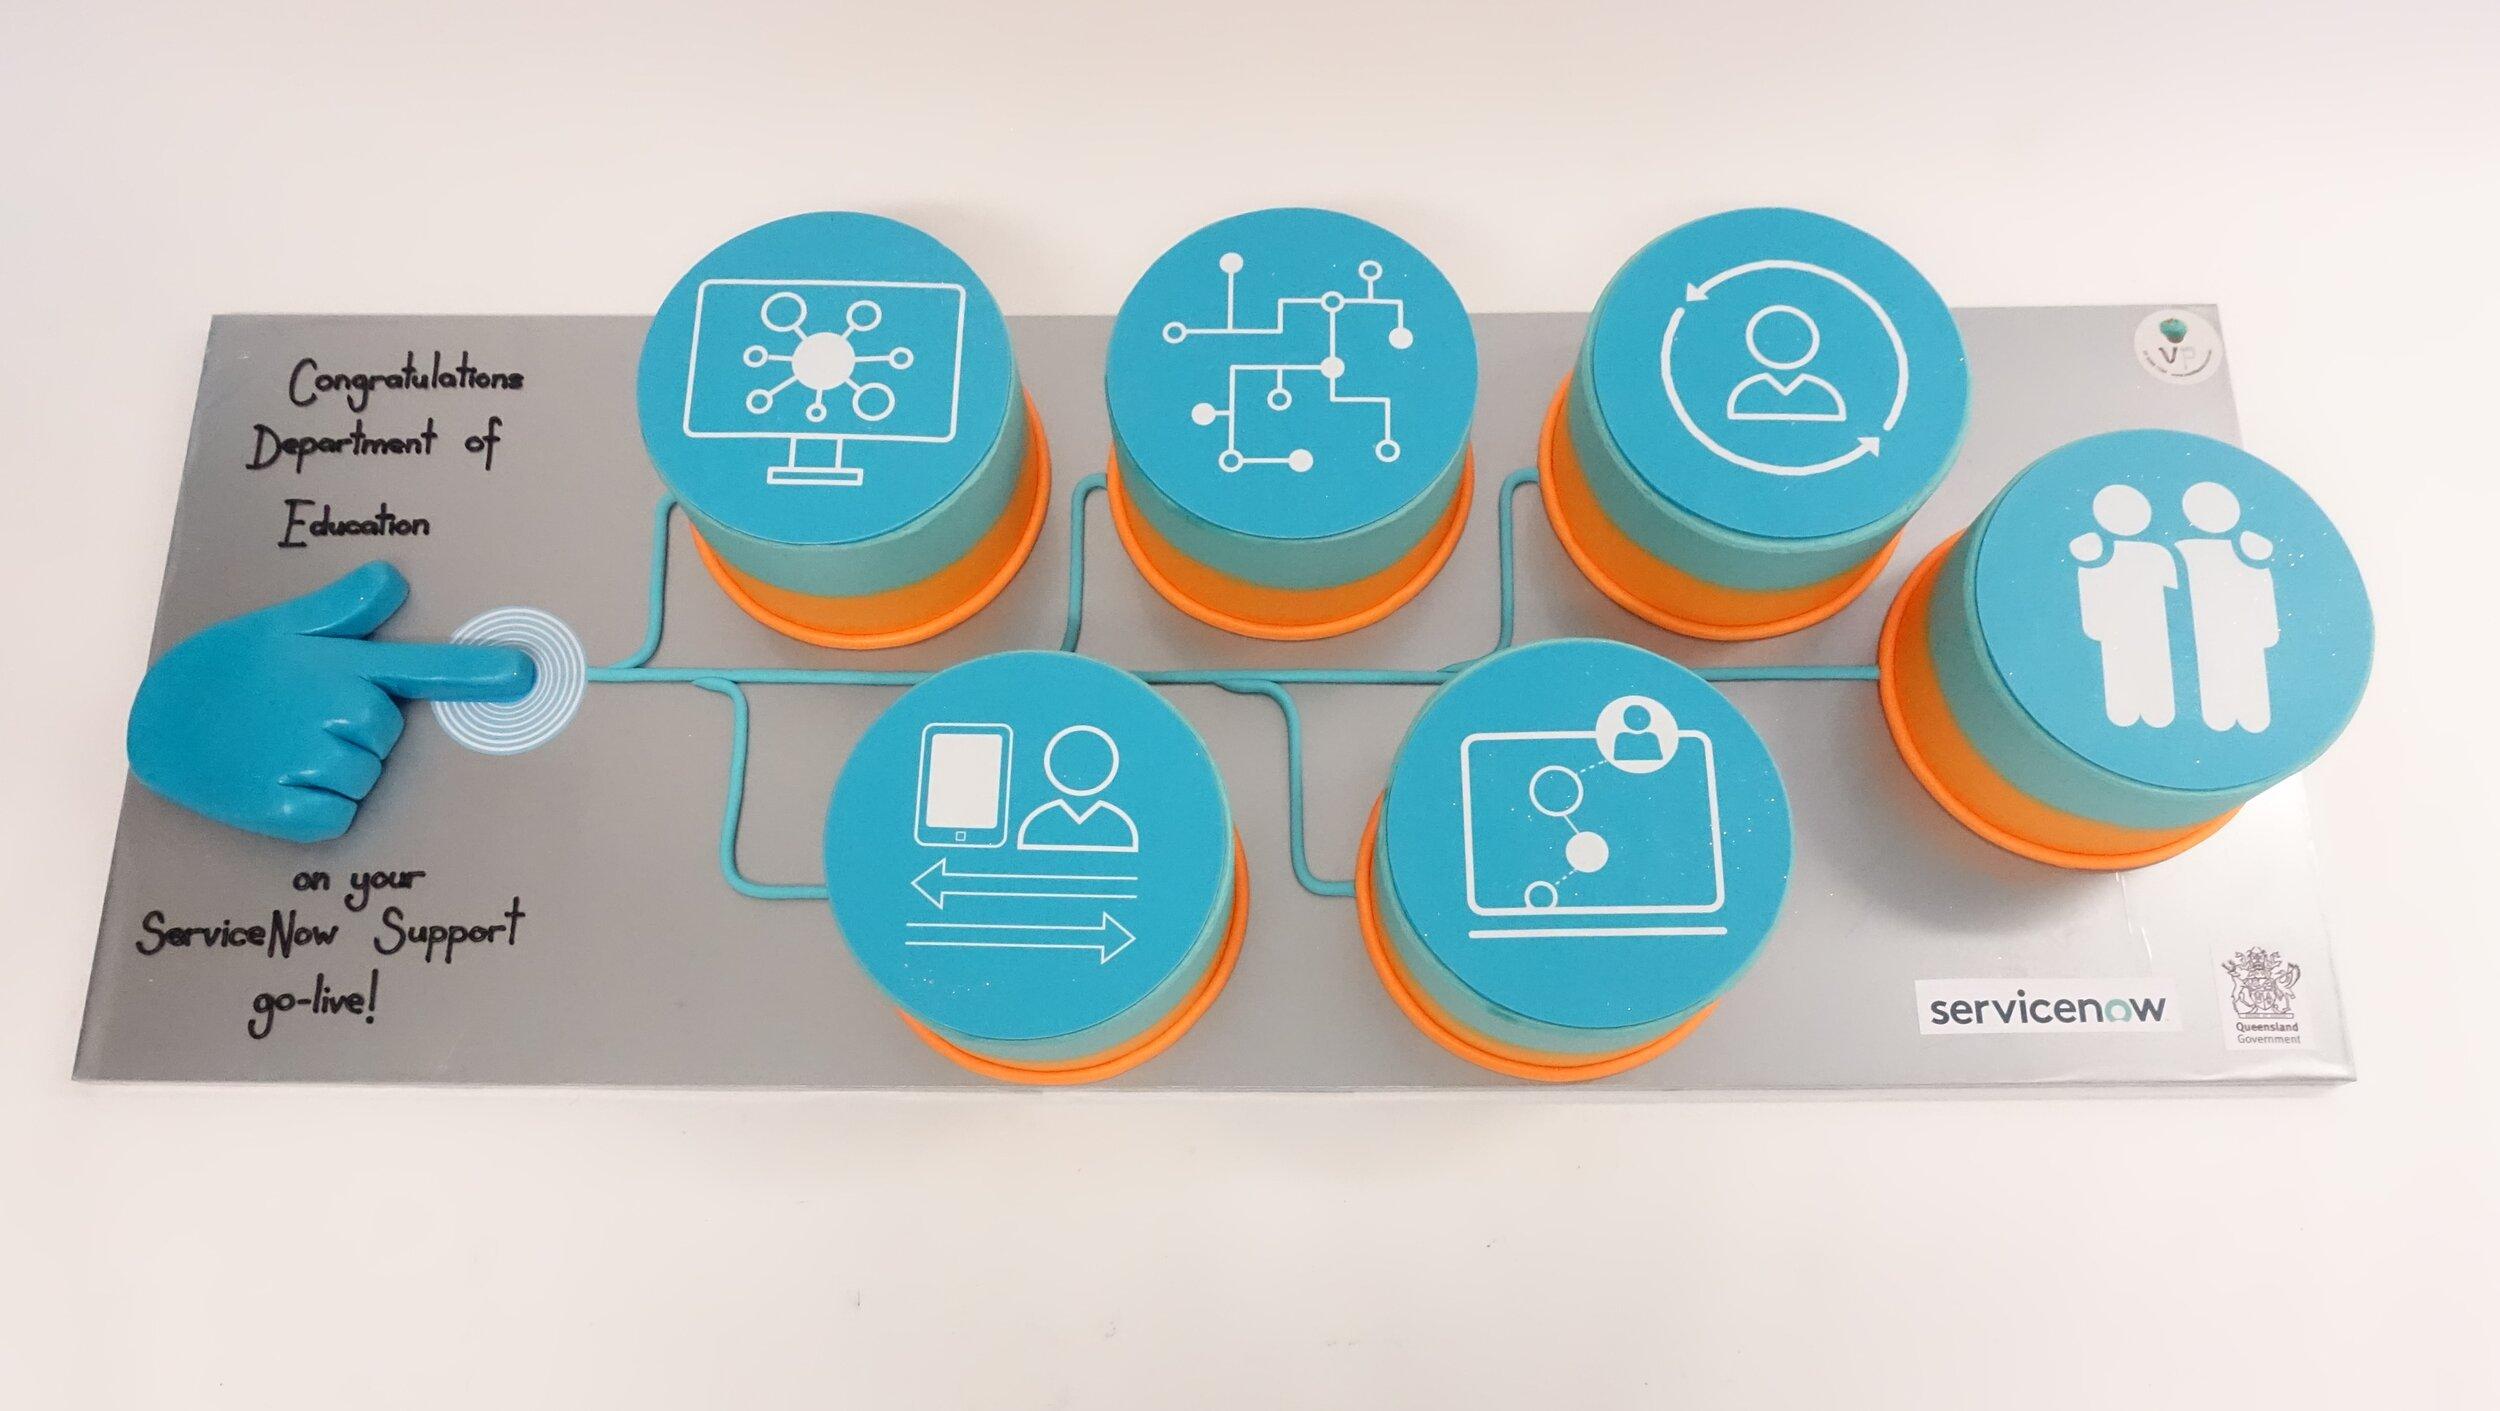 vanillapod-corporate-cake-brisbane-cupcakes (1).JPG